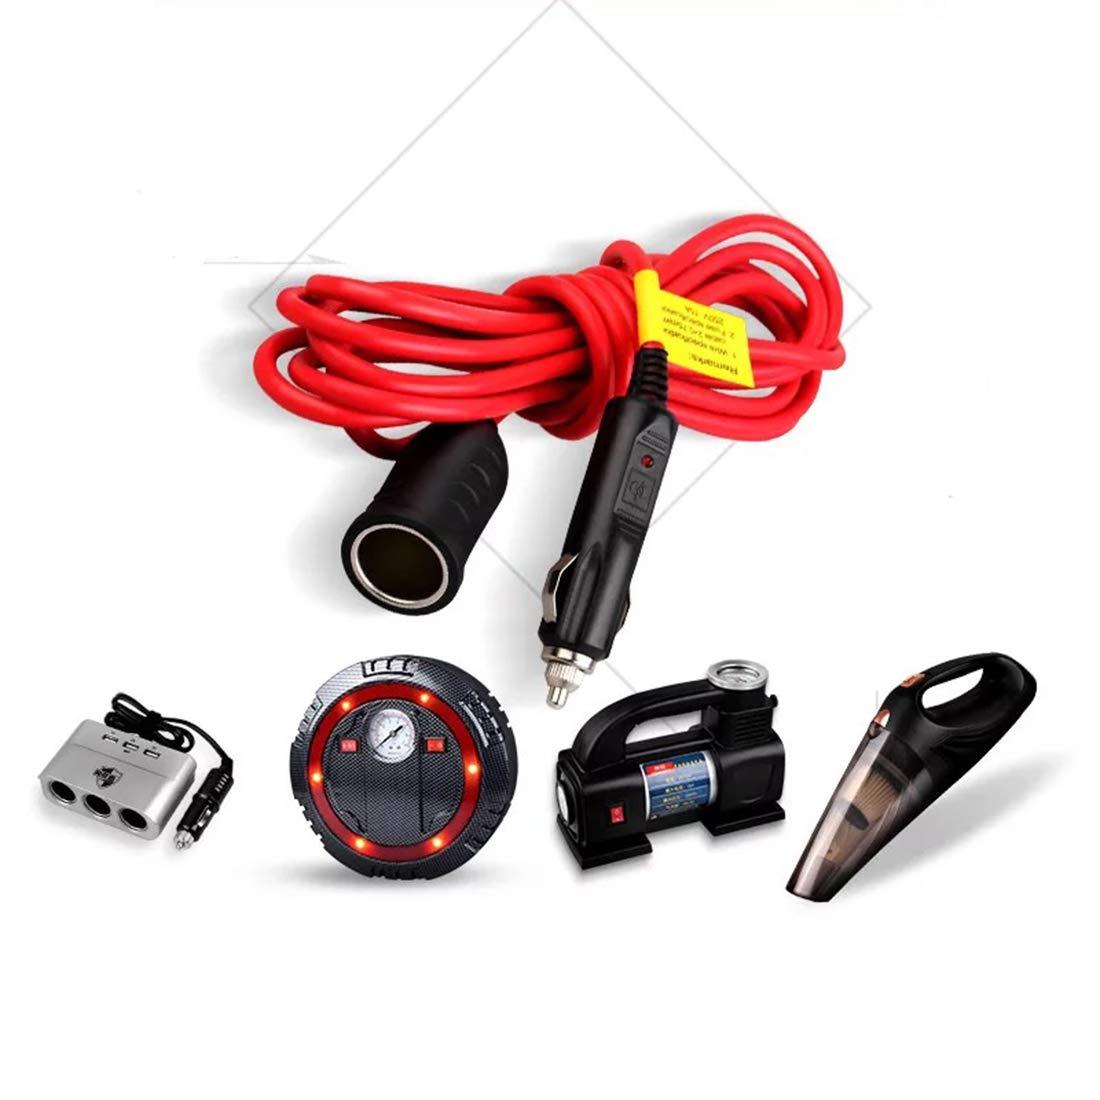 24V Kfz-Ladeger/ät mit Zigarettenanz/ünder 12V Zigarettenanz/ünder Stecker Verl/ängerungskabel 12ft 12V 15A Sicherung mit LED-Licht